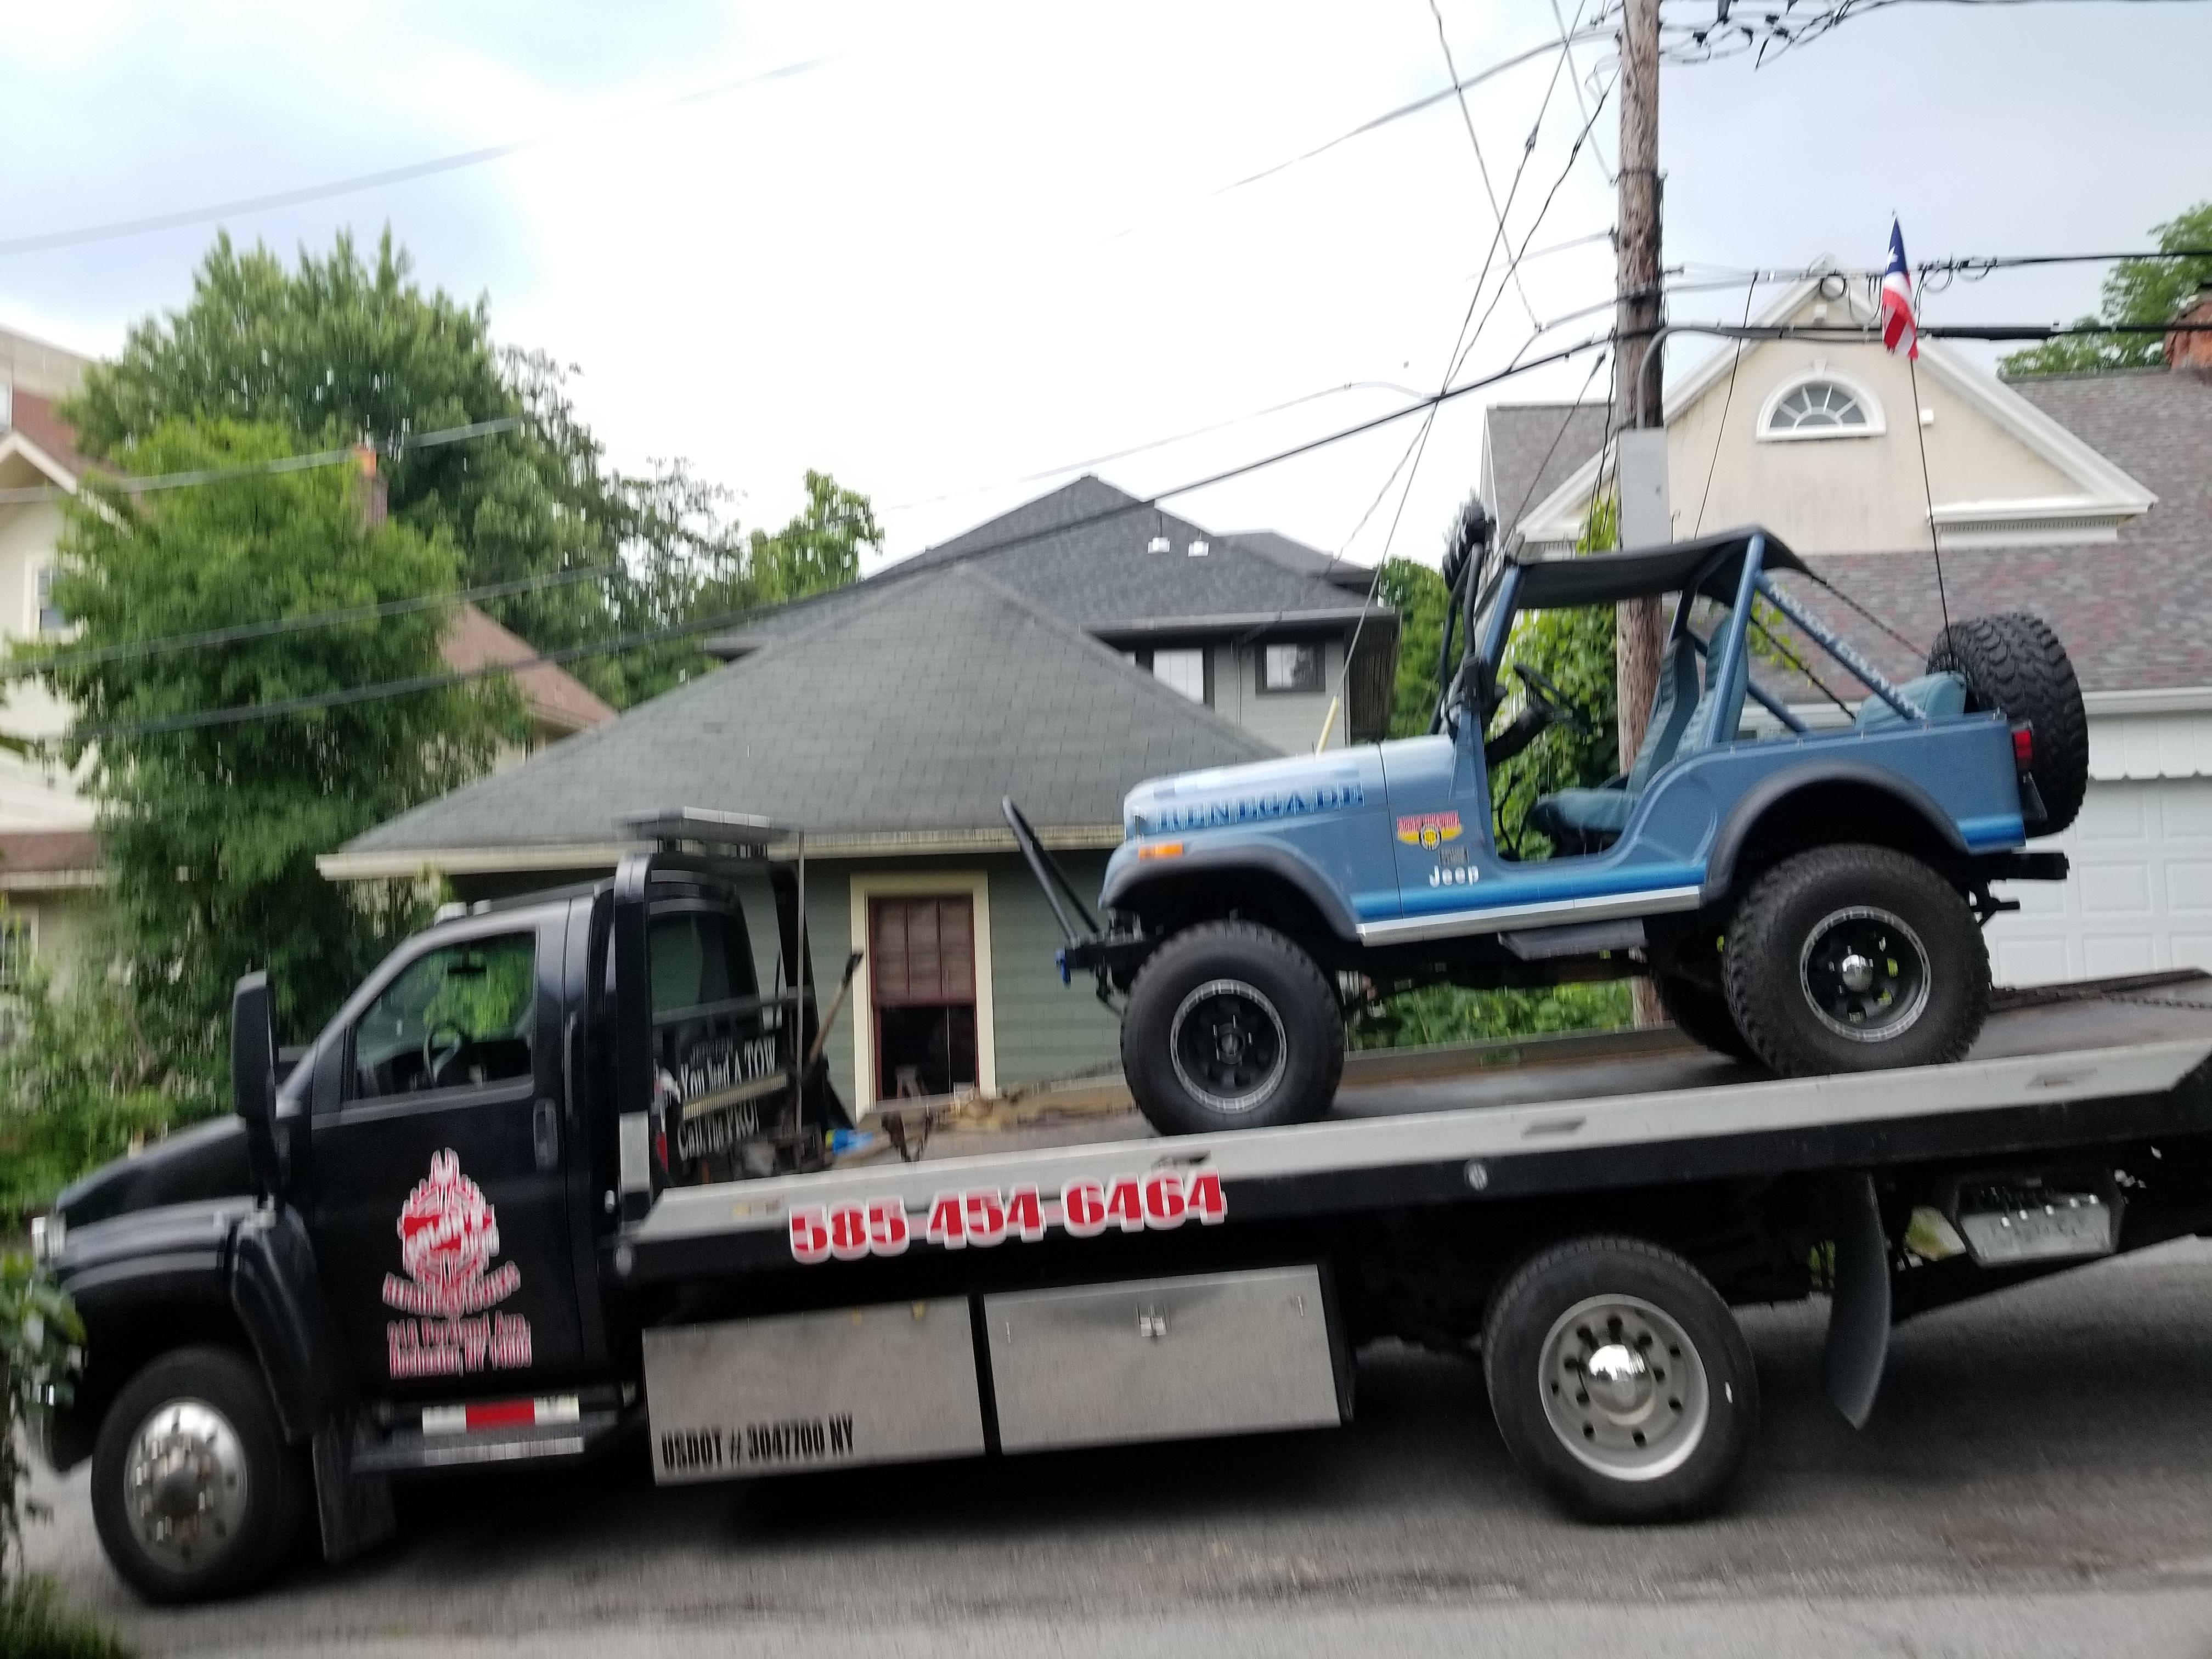 Colon's Auto Towing LLC image 1